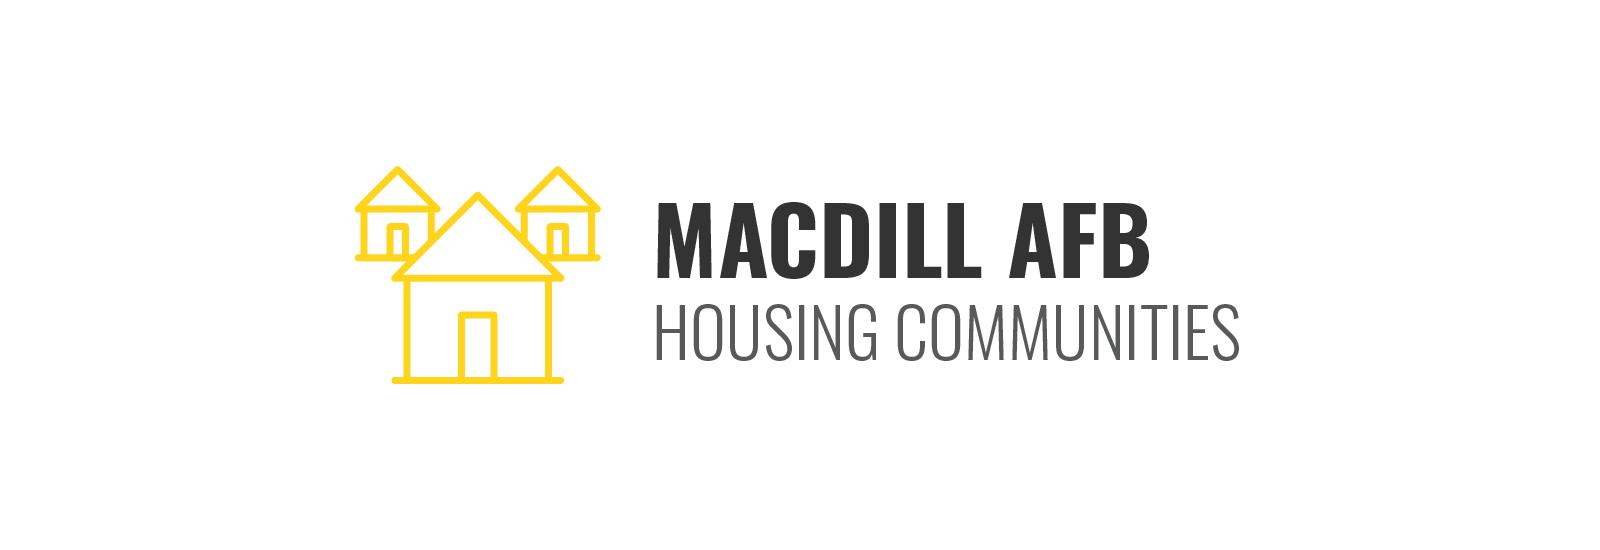 MacDill AFB Housing Communities